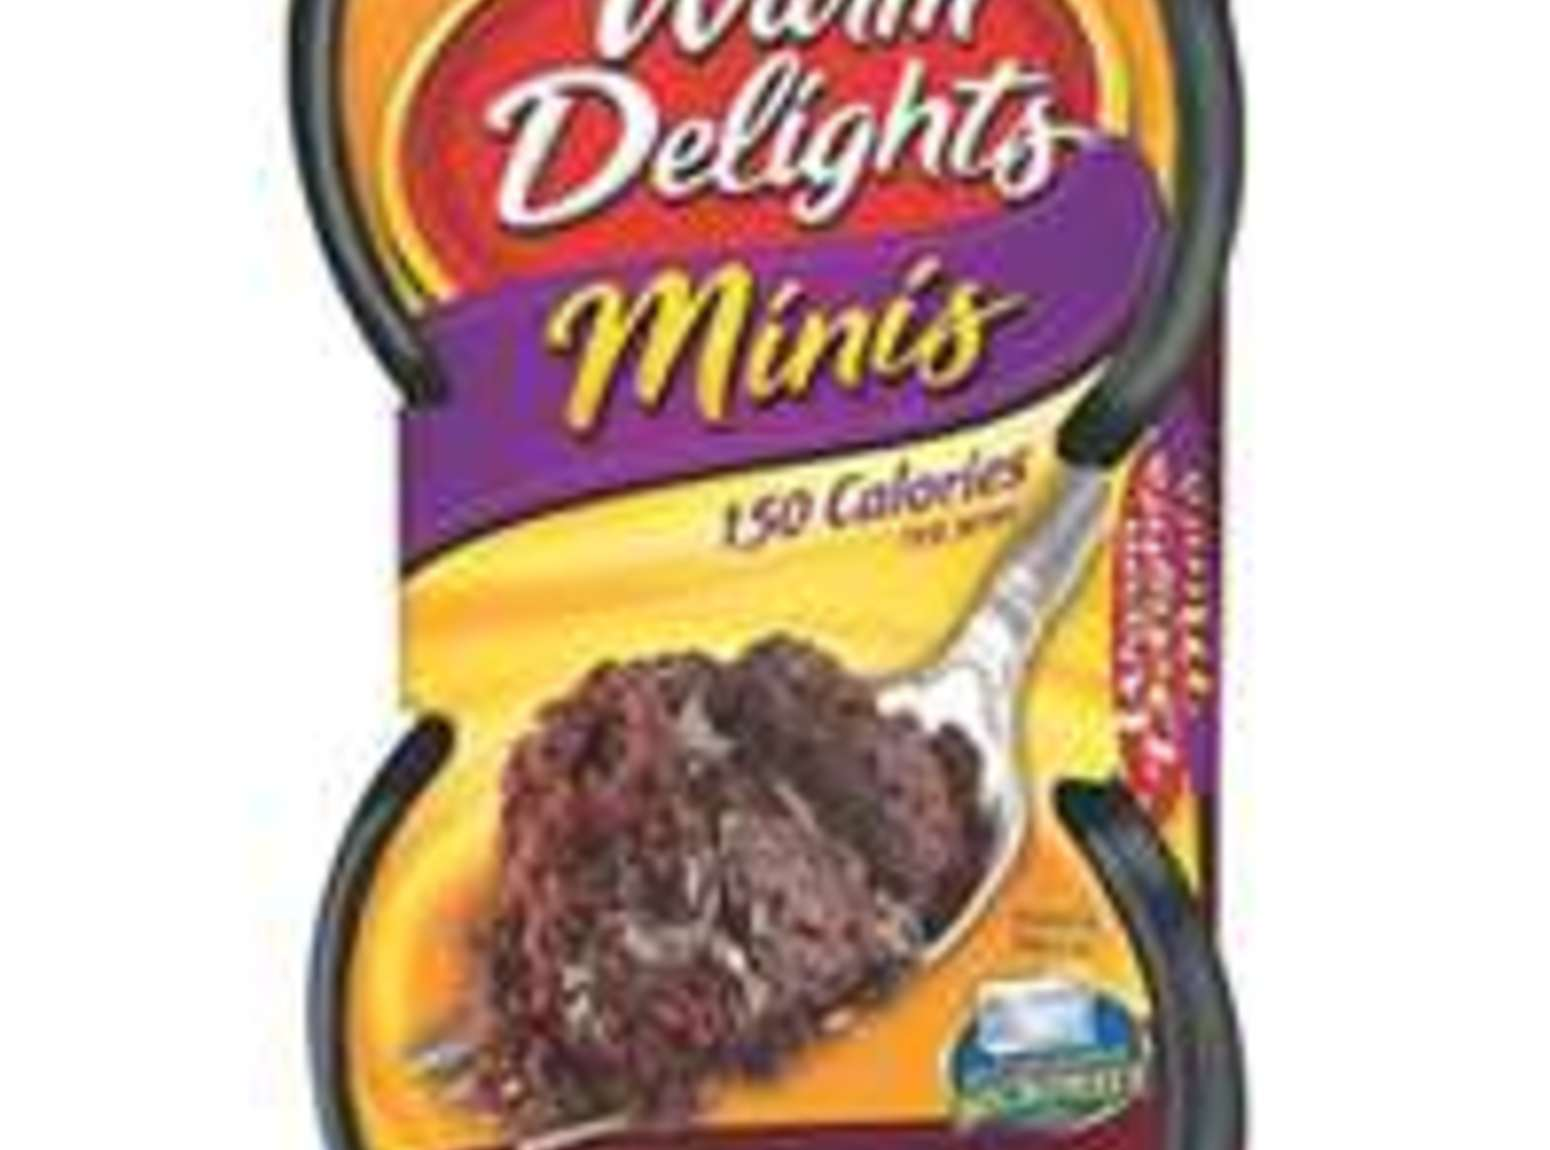 Warm delights mini's Molten chocolate cake copycat Recipe